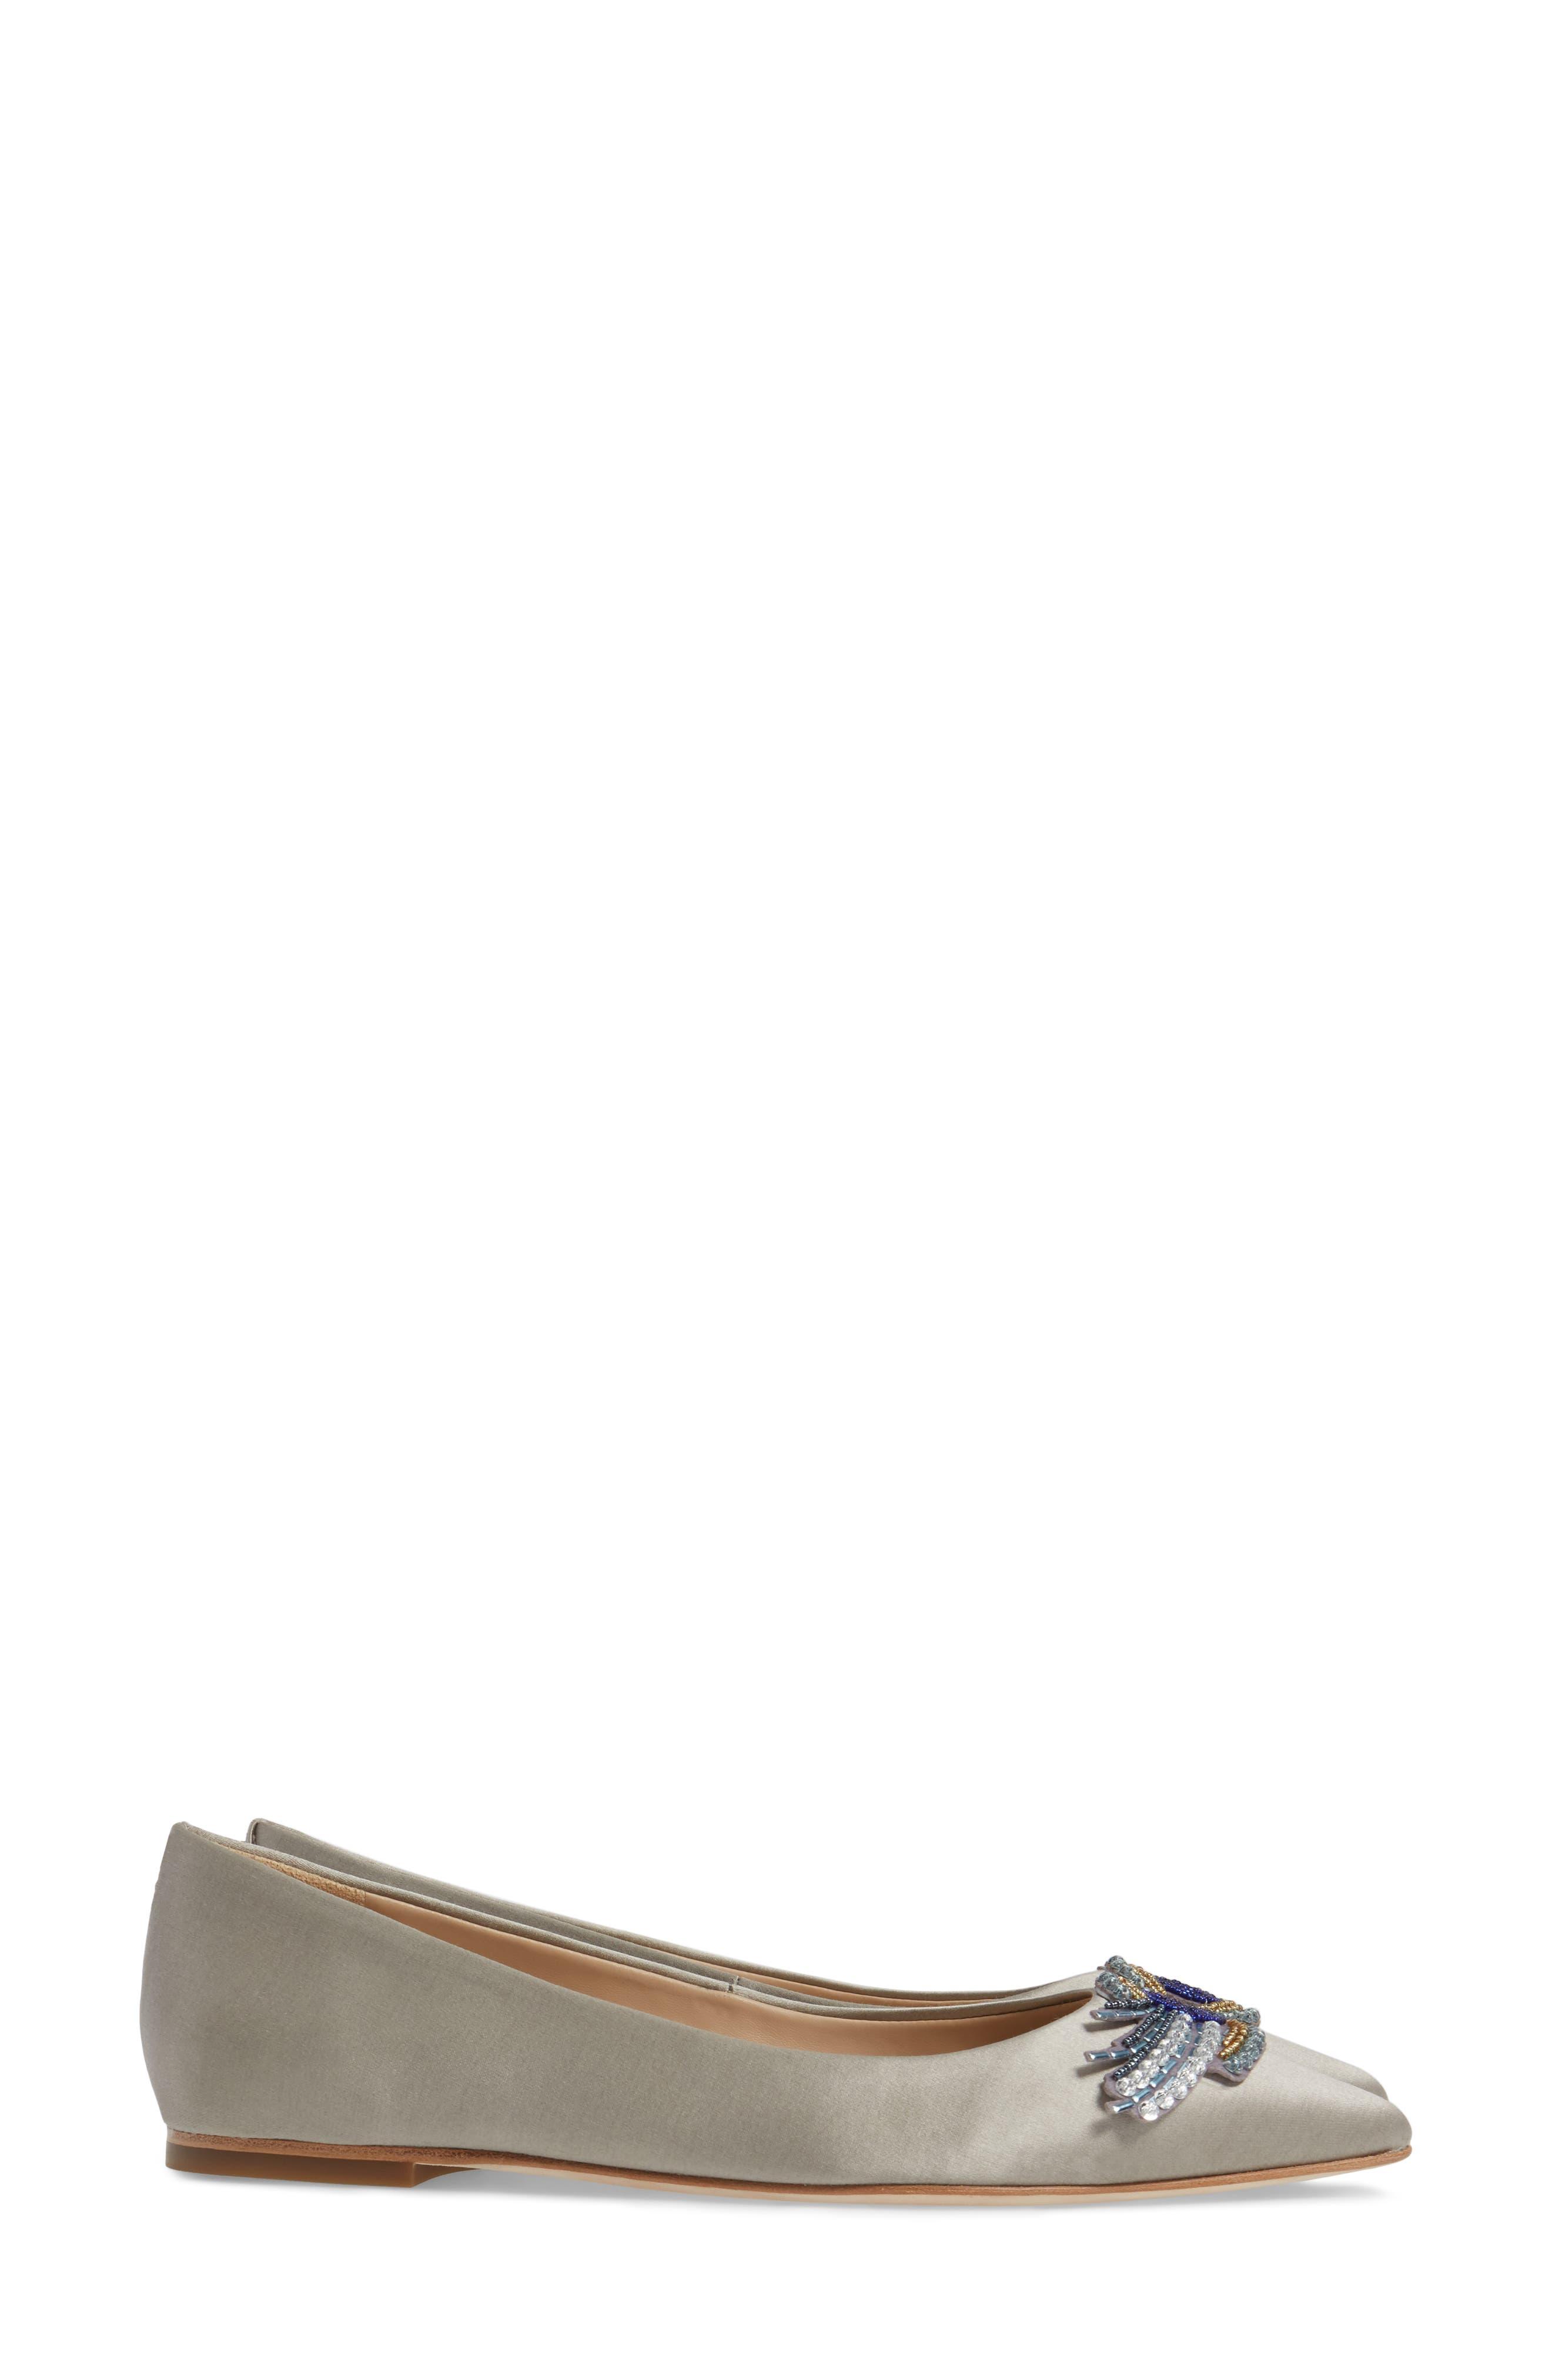 Rafaella Pointy Toe Ballet Flat,                             Alternate thumbnail 4, color,                             020